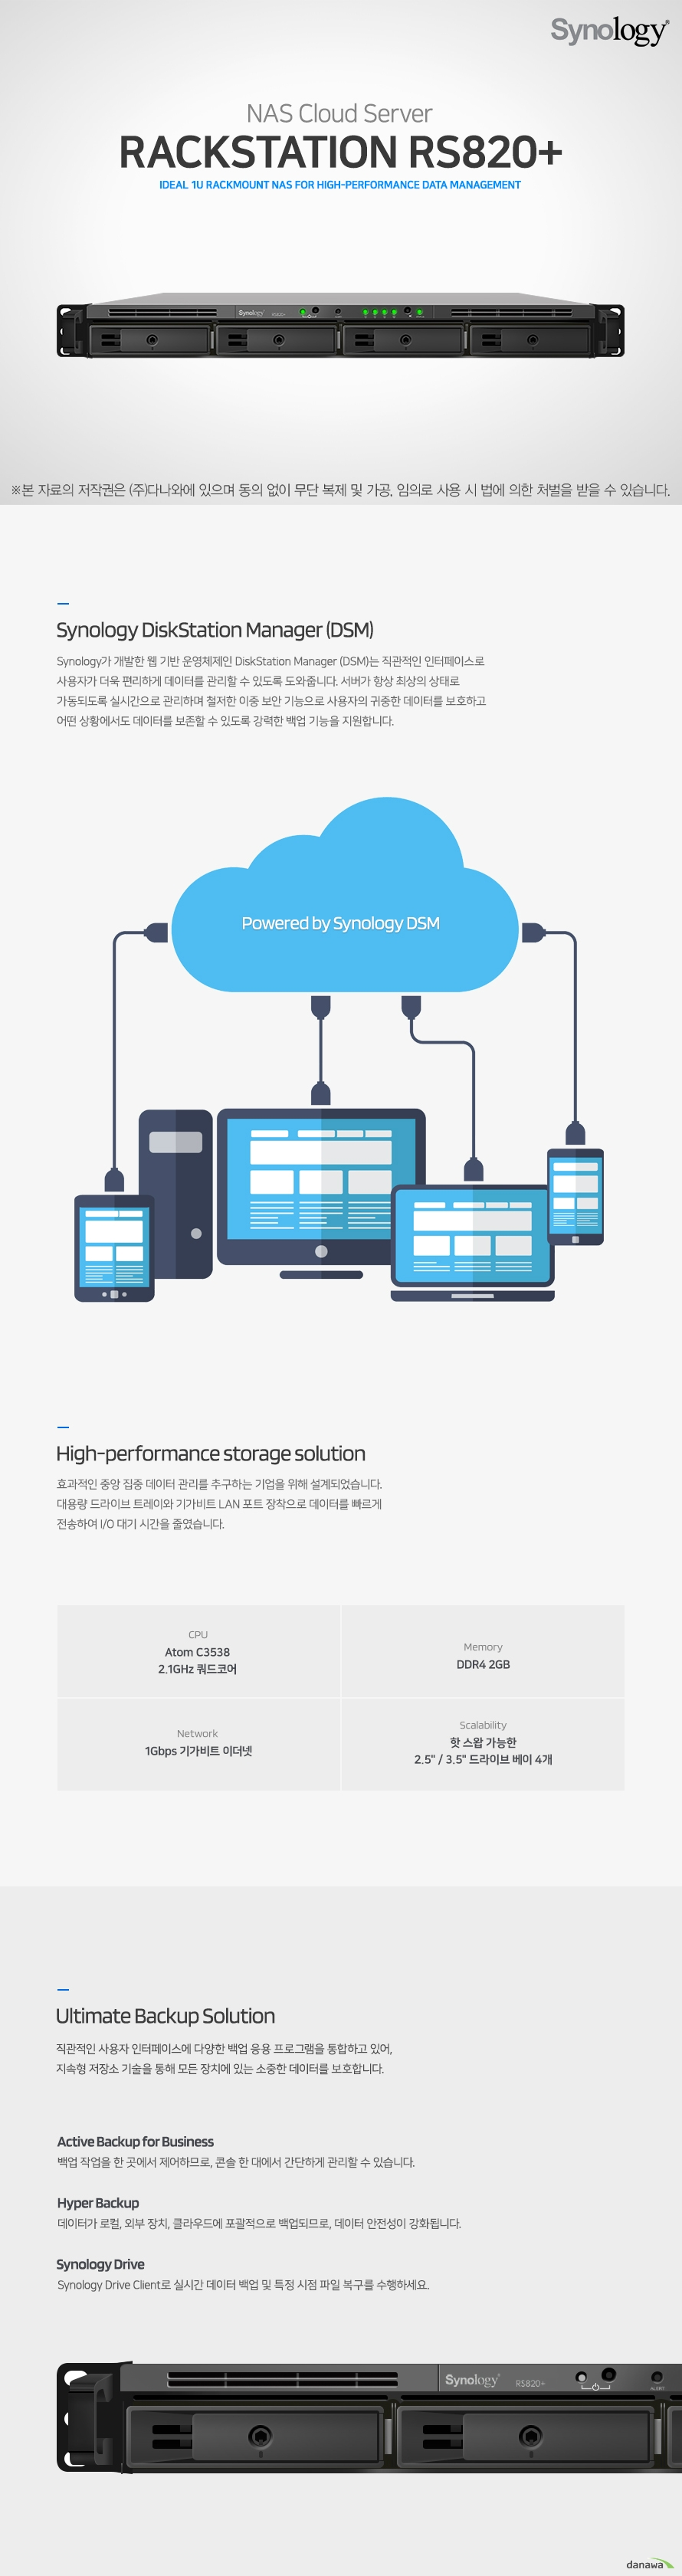 Synology RS820plus  Synology가 개발한 웹 기반 운영체제인 DiskStation Manager (DSM)는 직관적인 인터페이스로 사용자가 더욱 편리하게 데이터를 관리할 수 있도록 도와줍니다. 서버가 항상 최상의 상태로 가동되도록 실시간으로 관리하며 철저한 이중 보안 기능으로 사용자의 귀중한 데이터를 보호하고 어떤 상황에서도 데이터를 보존할 수 있도록 강력한 백업 기능을 지원합니다.   효과적인 중앙 집중 데이터 관리를 추구하는 기업을 위해 설계되었습니다. 대용량 드라이브 트레이와 기가비트 LAN 포트 장착으로 데이터를 빠르게 전송하여 I/O 대기 시간을 줄였습니다.   직관적인 사용자 인터페이스에 다양한 백업 응용 프로그램을 통합하고 있어, 지속형 저장소 기술을 통해 모든 장치에 있는 소중한 데이터를 보호합니다.  Btrfs 파일 시스템은 데이터 손상을 방지하고 유지 관리 부담을 줄일 수 있는  고급 스토리지 기술과 최적화된 스냅샷을 도입합니다. 높은 수준의 데이터 무결성을 유지하면서 유연하고 효율적인 데이터 보호 및 복구 도구를 제공합니다.  Synology Office 문서, 스프레드 시트 및 슬라이드를 사용 하여 업무 능률을 높여보세요. 실시간 파일 동기화 기능과 강력한 데이터 백업 및 보호 기능을 제공합니다.